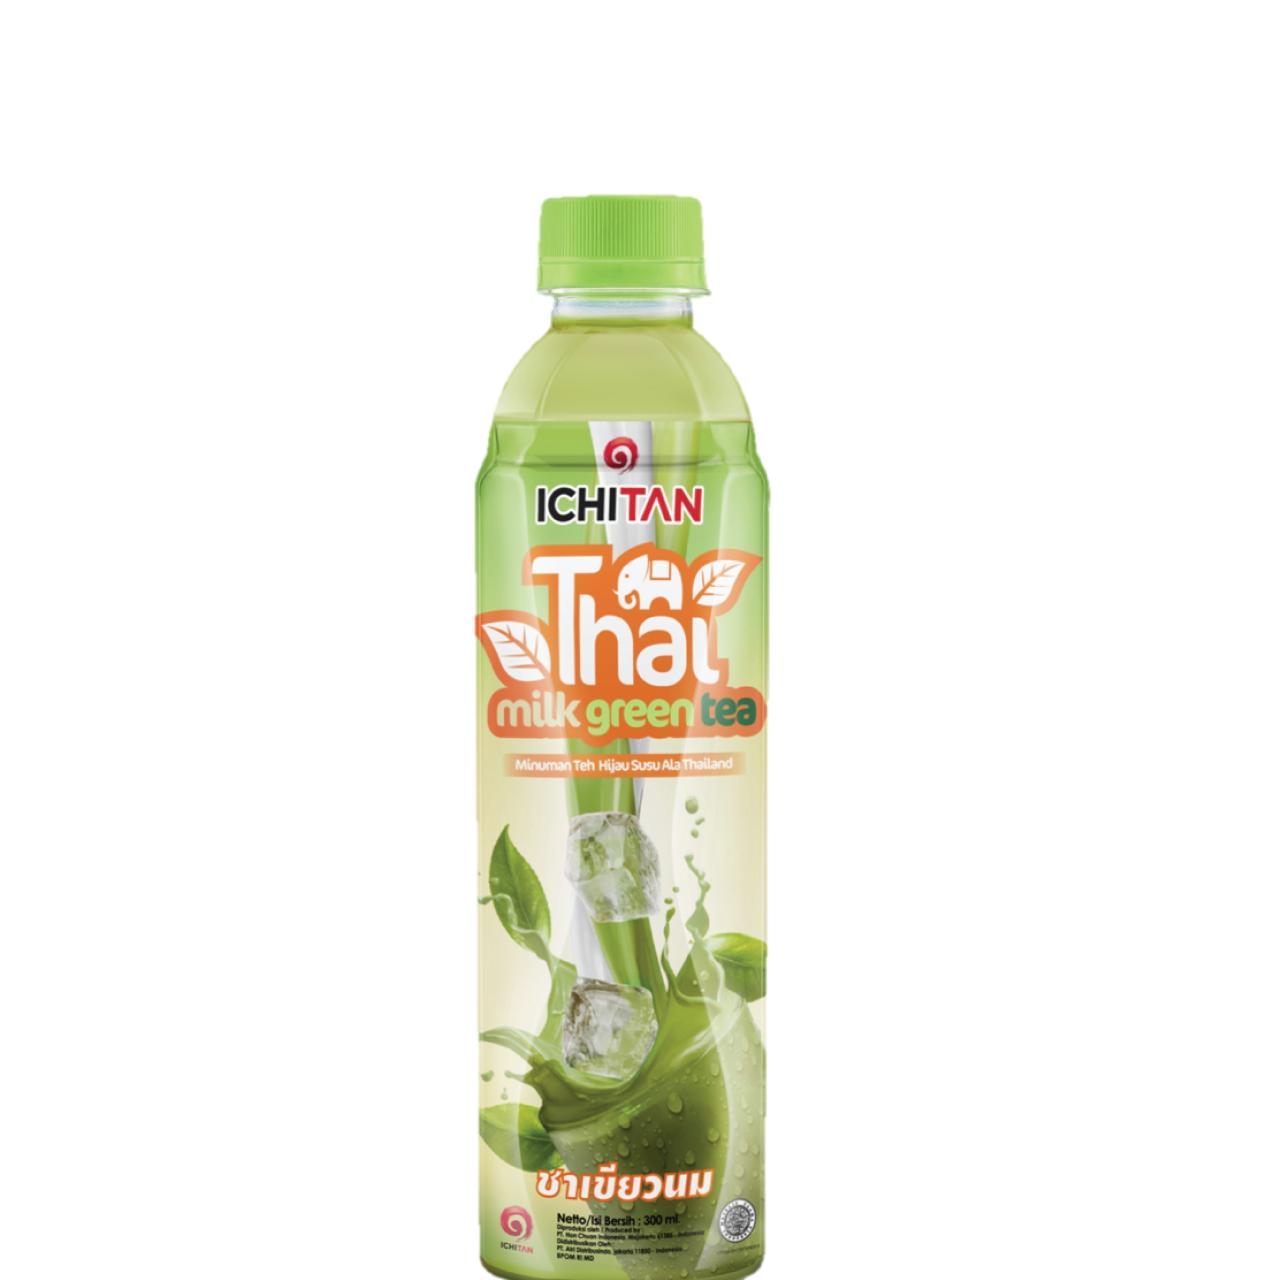 Ichitan Thai Milk Green Tea 310ml